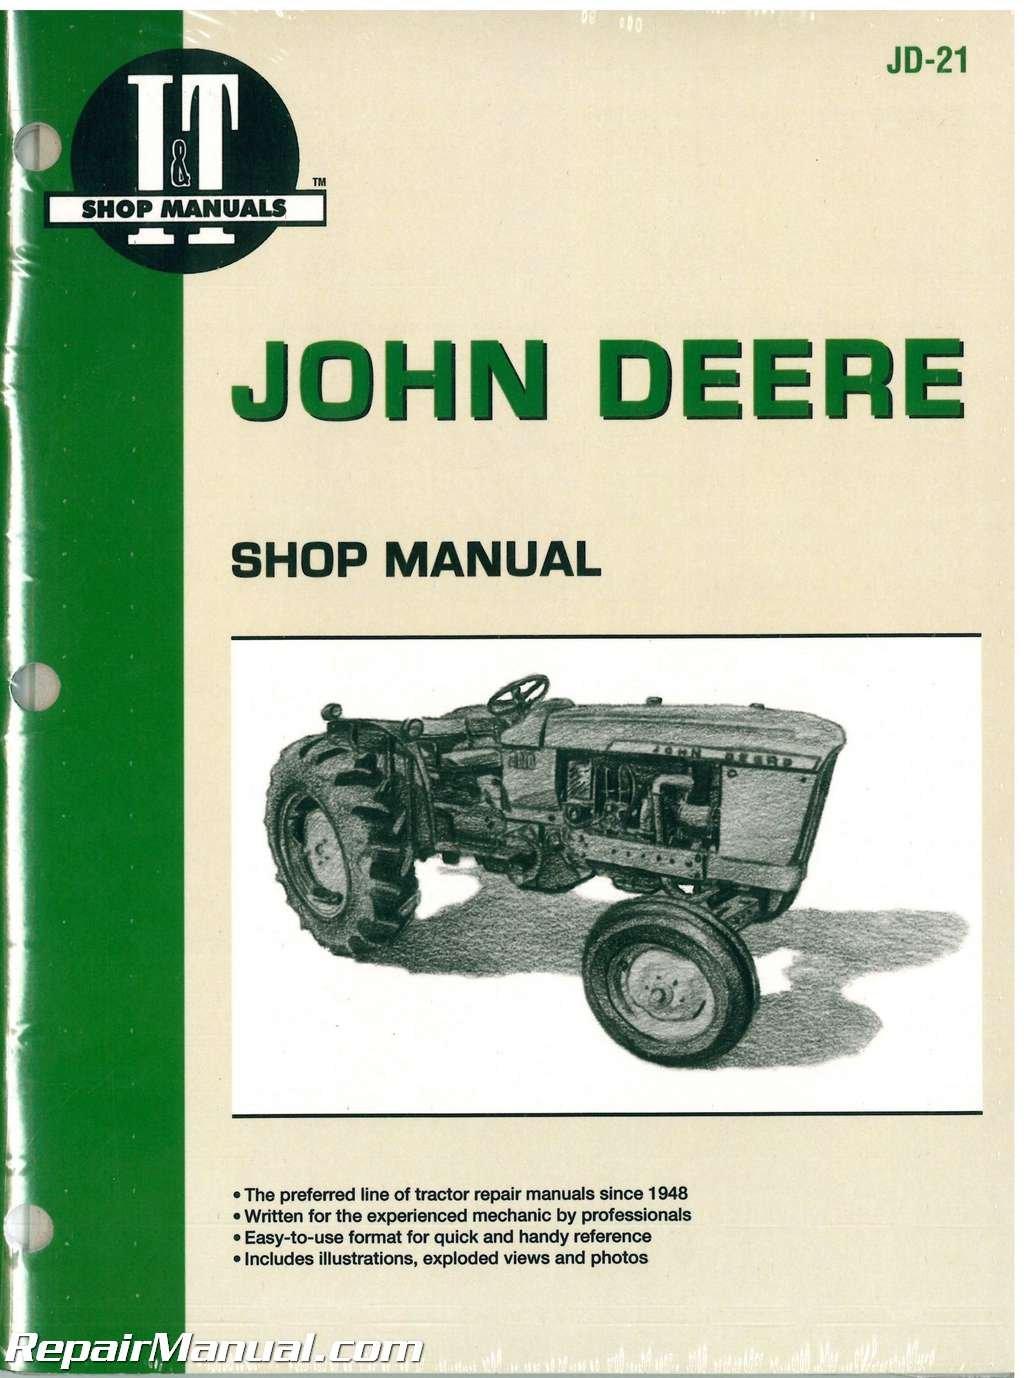 JD-21 John Deere 1010 2010 Tractor Workshop Service Manual: Manufacturer:  Amazon.com: Books